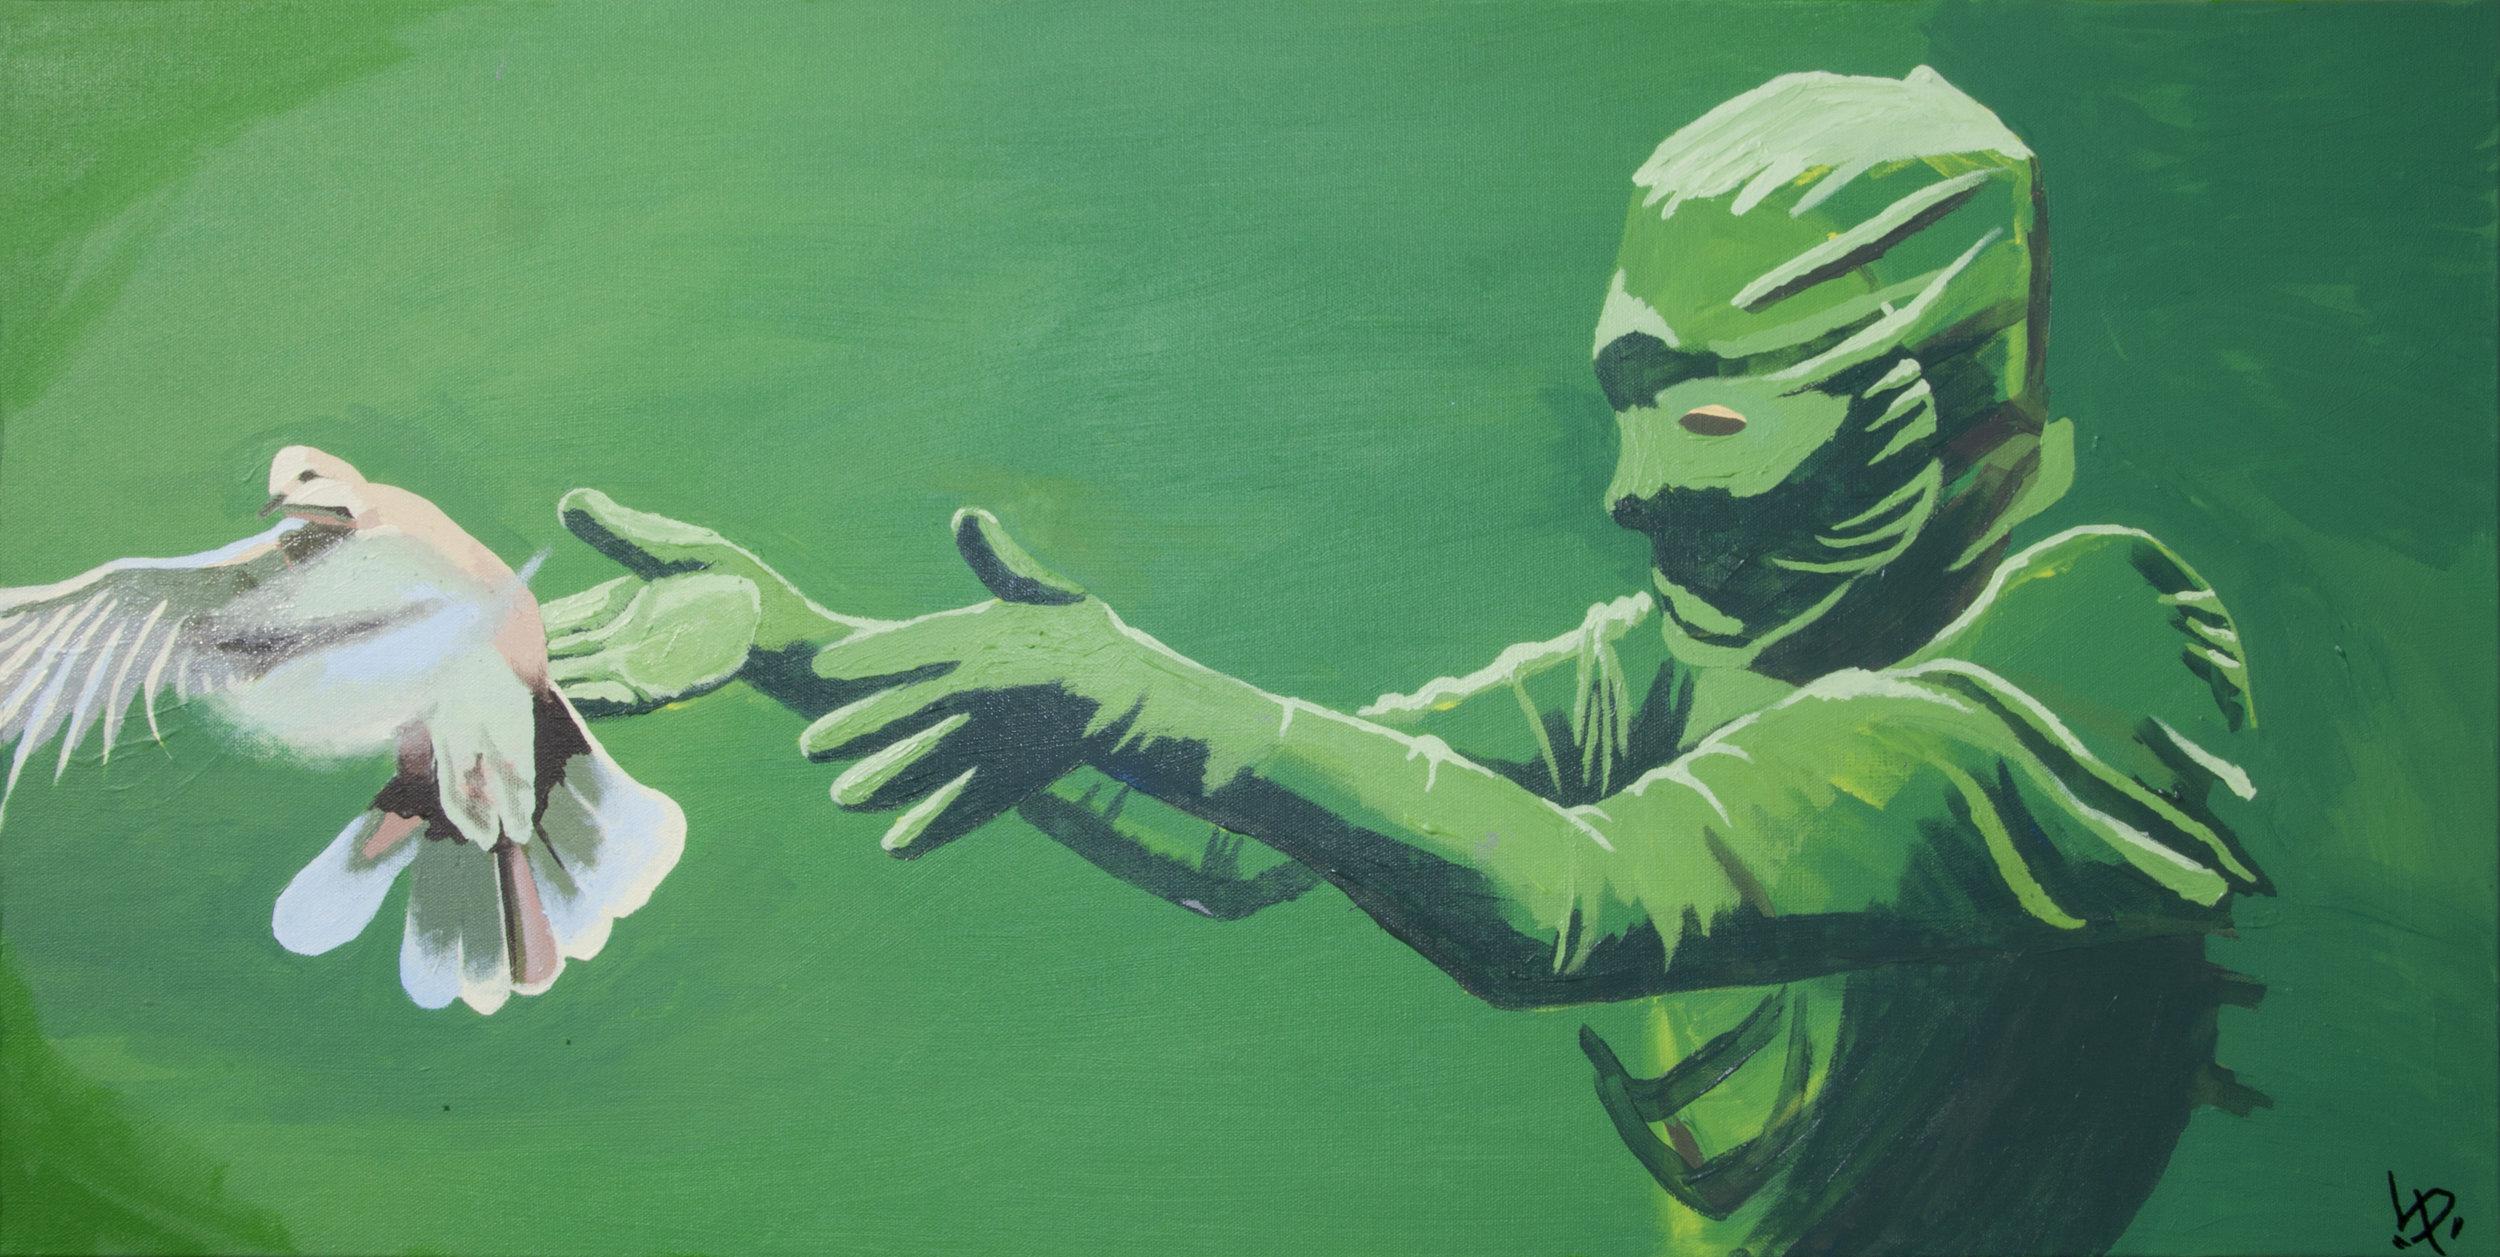 Green Screen Bird Releaser    by Lauren Porter, $1,000  3' x 1.5'